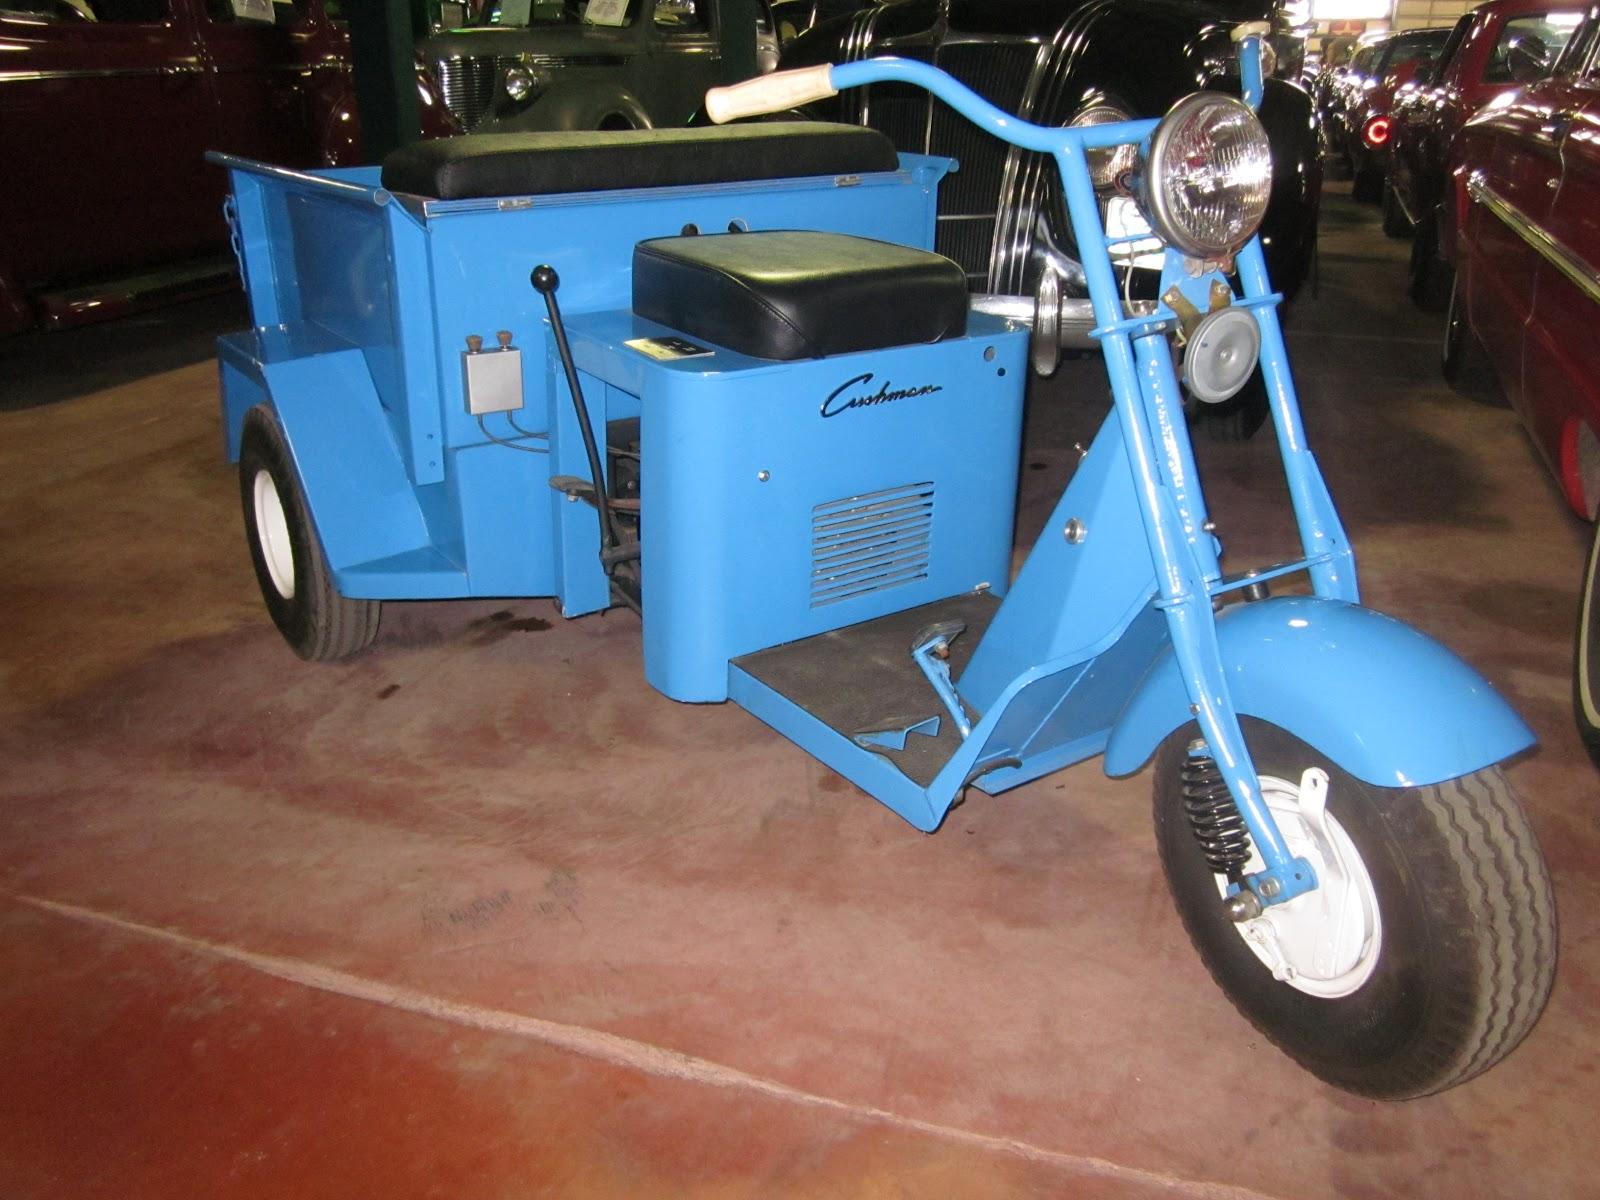 1948 Cushman 3 Wheeler on display at the LeMay Family Museum, Spanaway ...